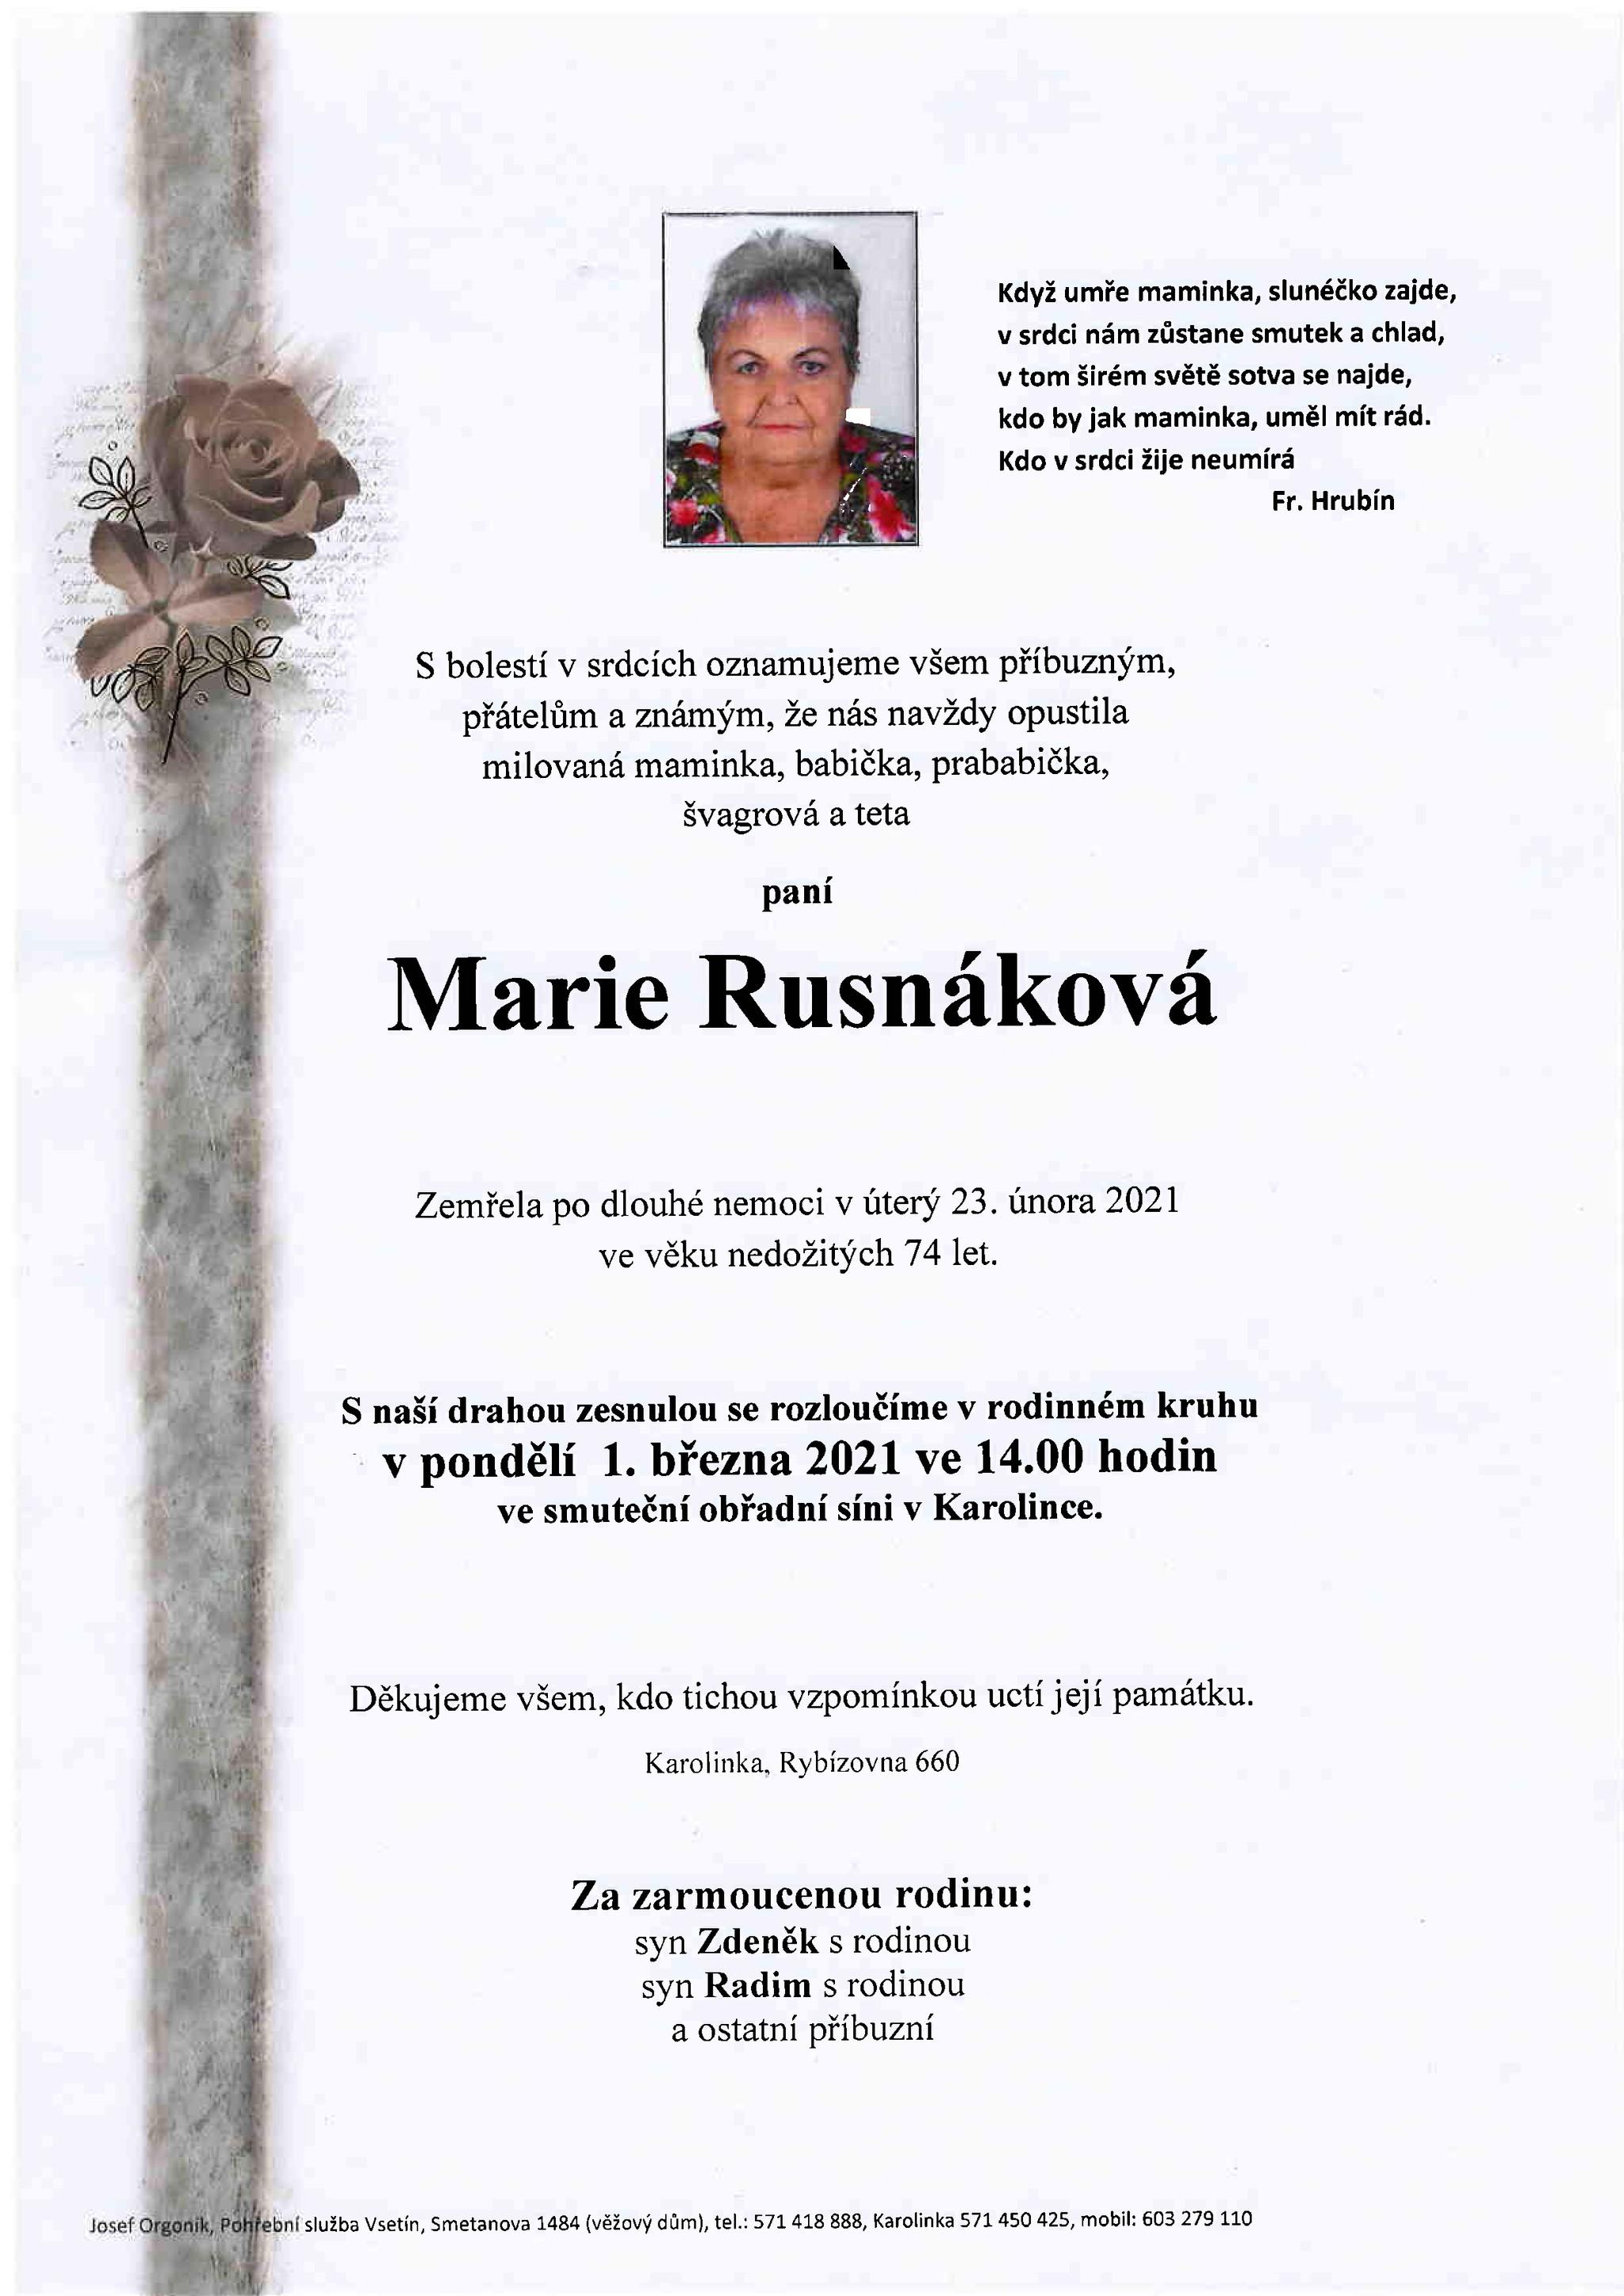 Marie Rusnáková